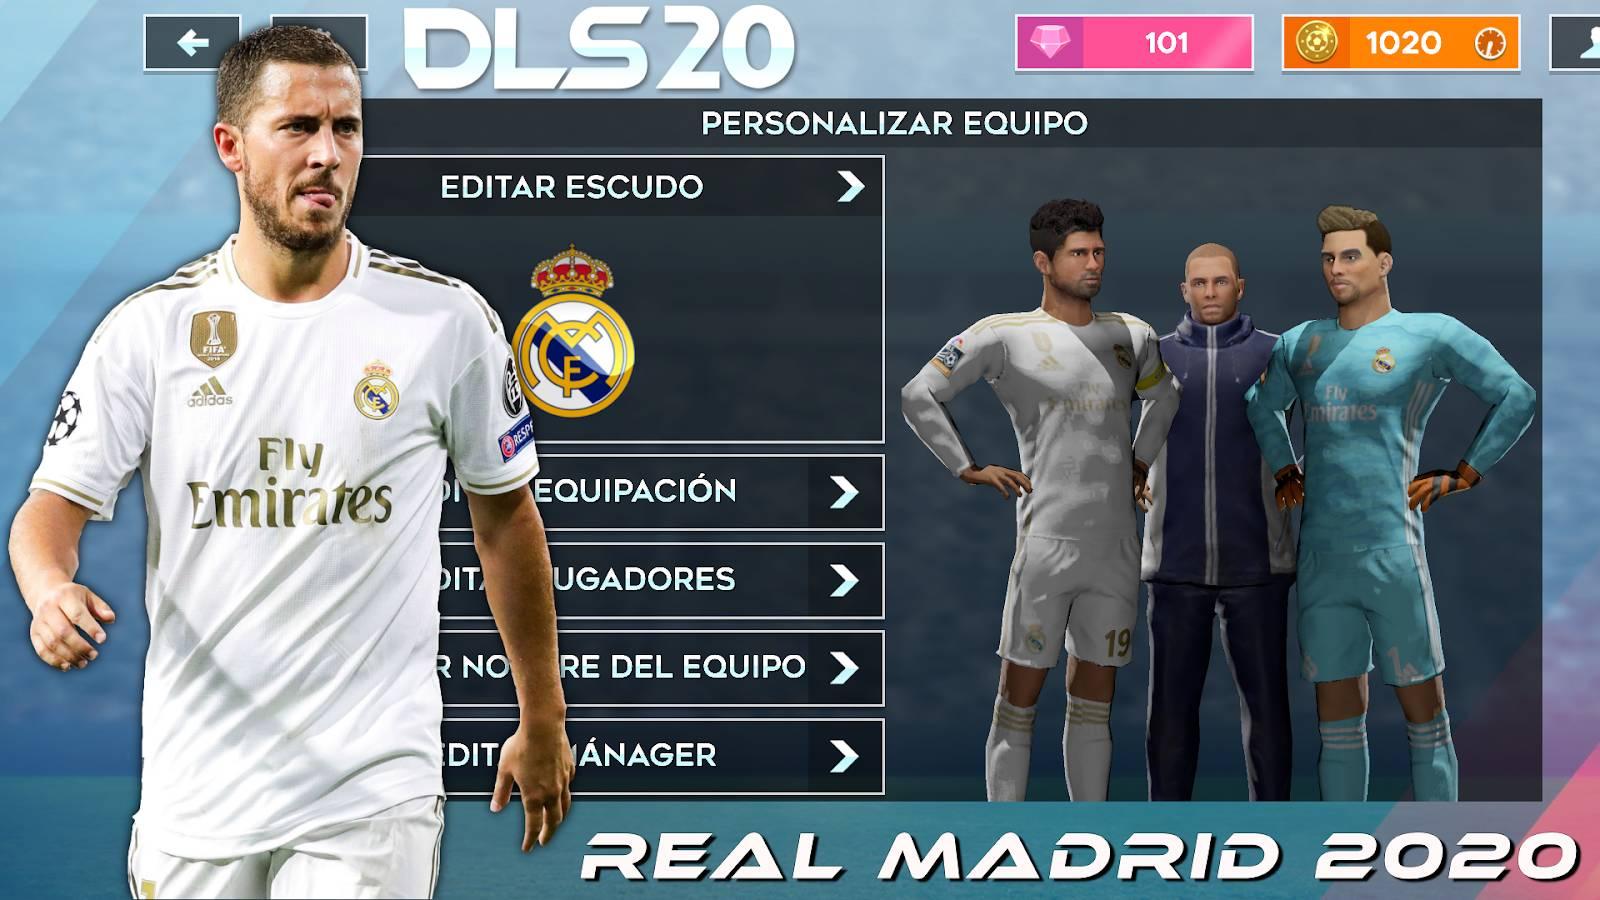 DLS 20 Mod APK Real Madrid Team 2020 Download 1600x900